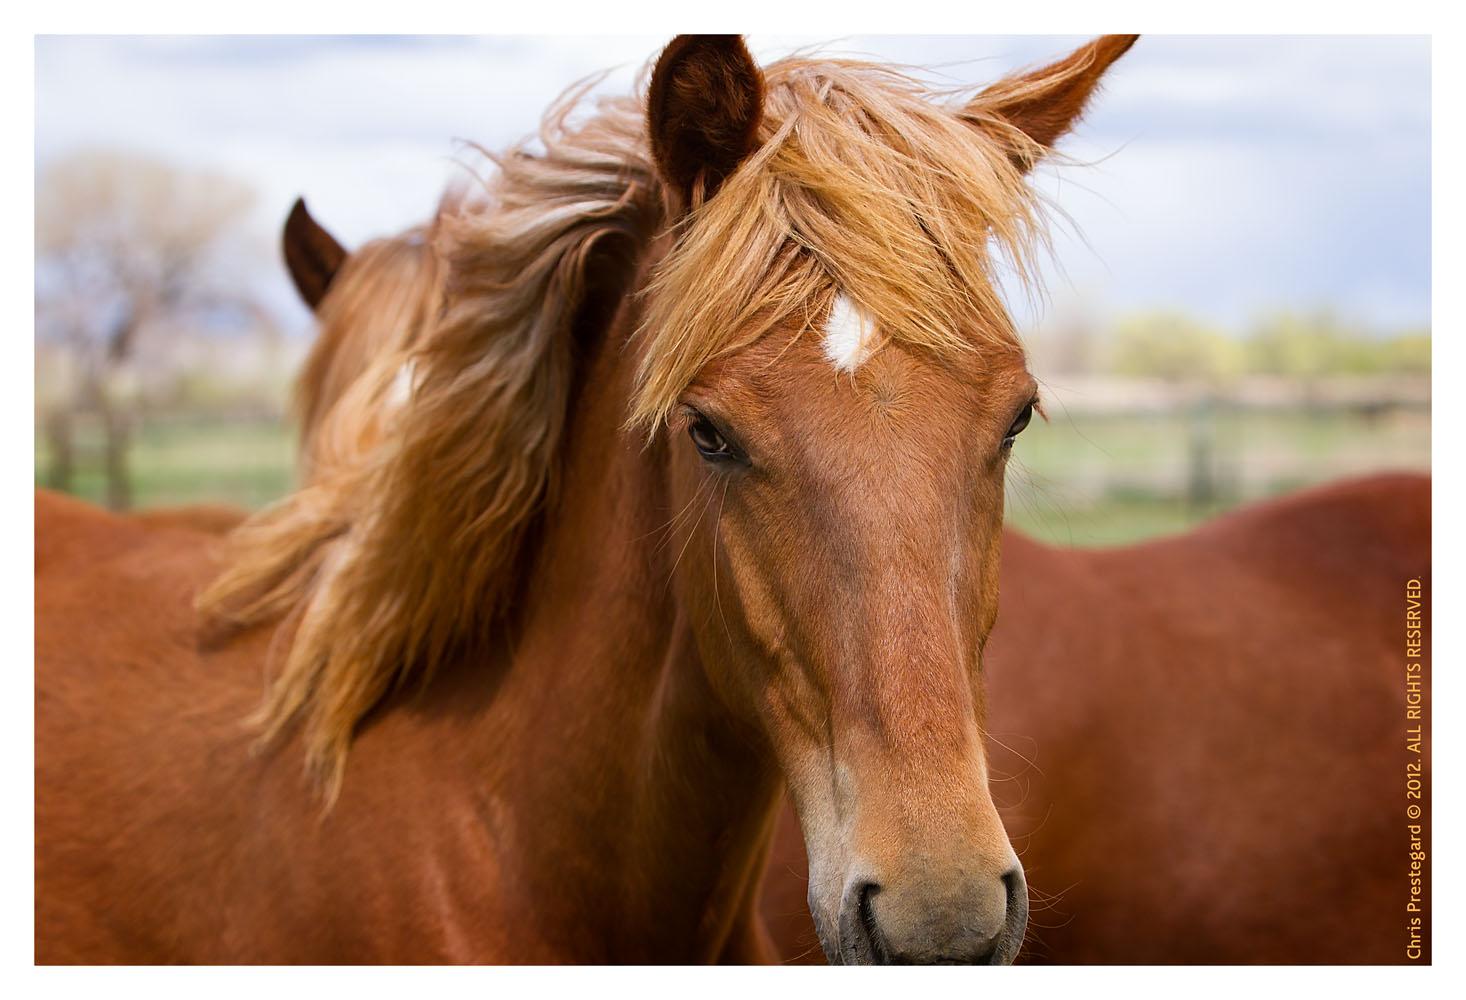 Horse3196-Feb13-2012